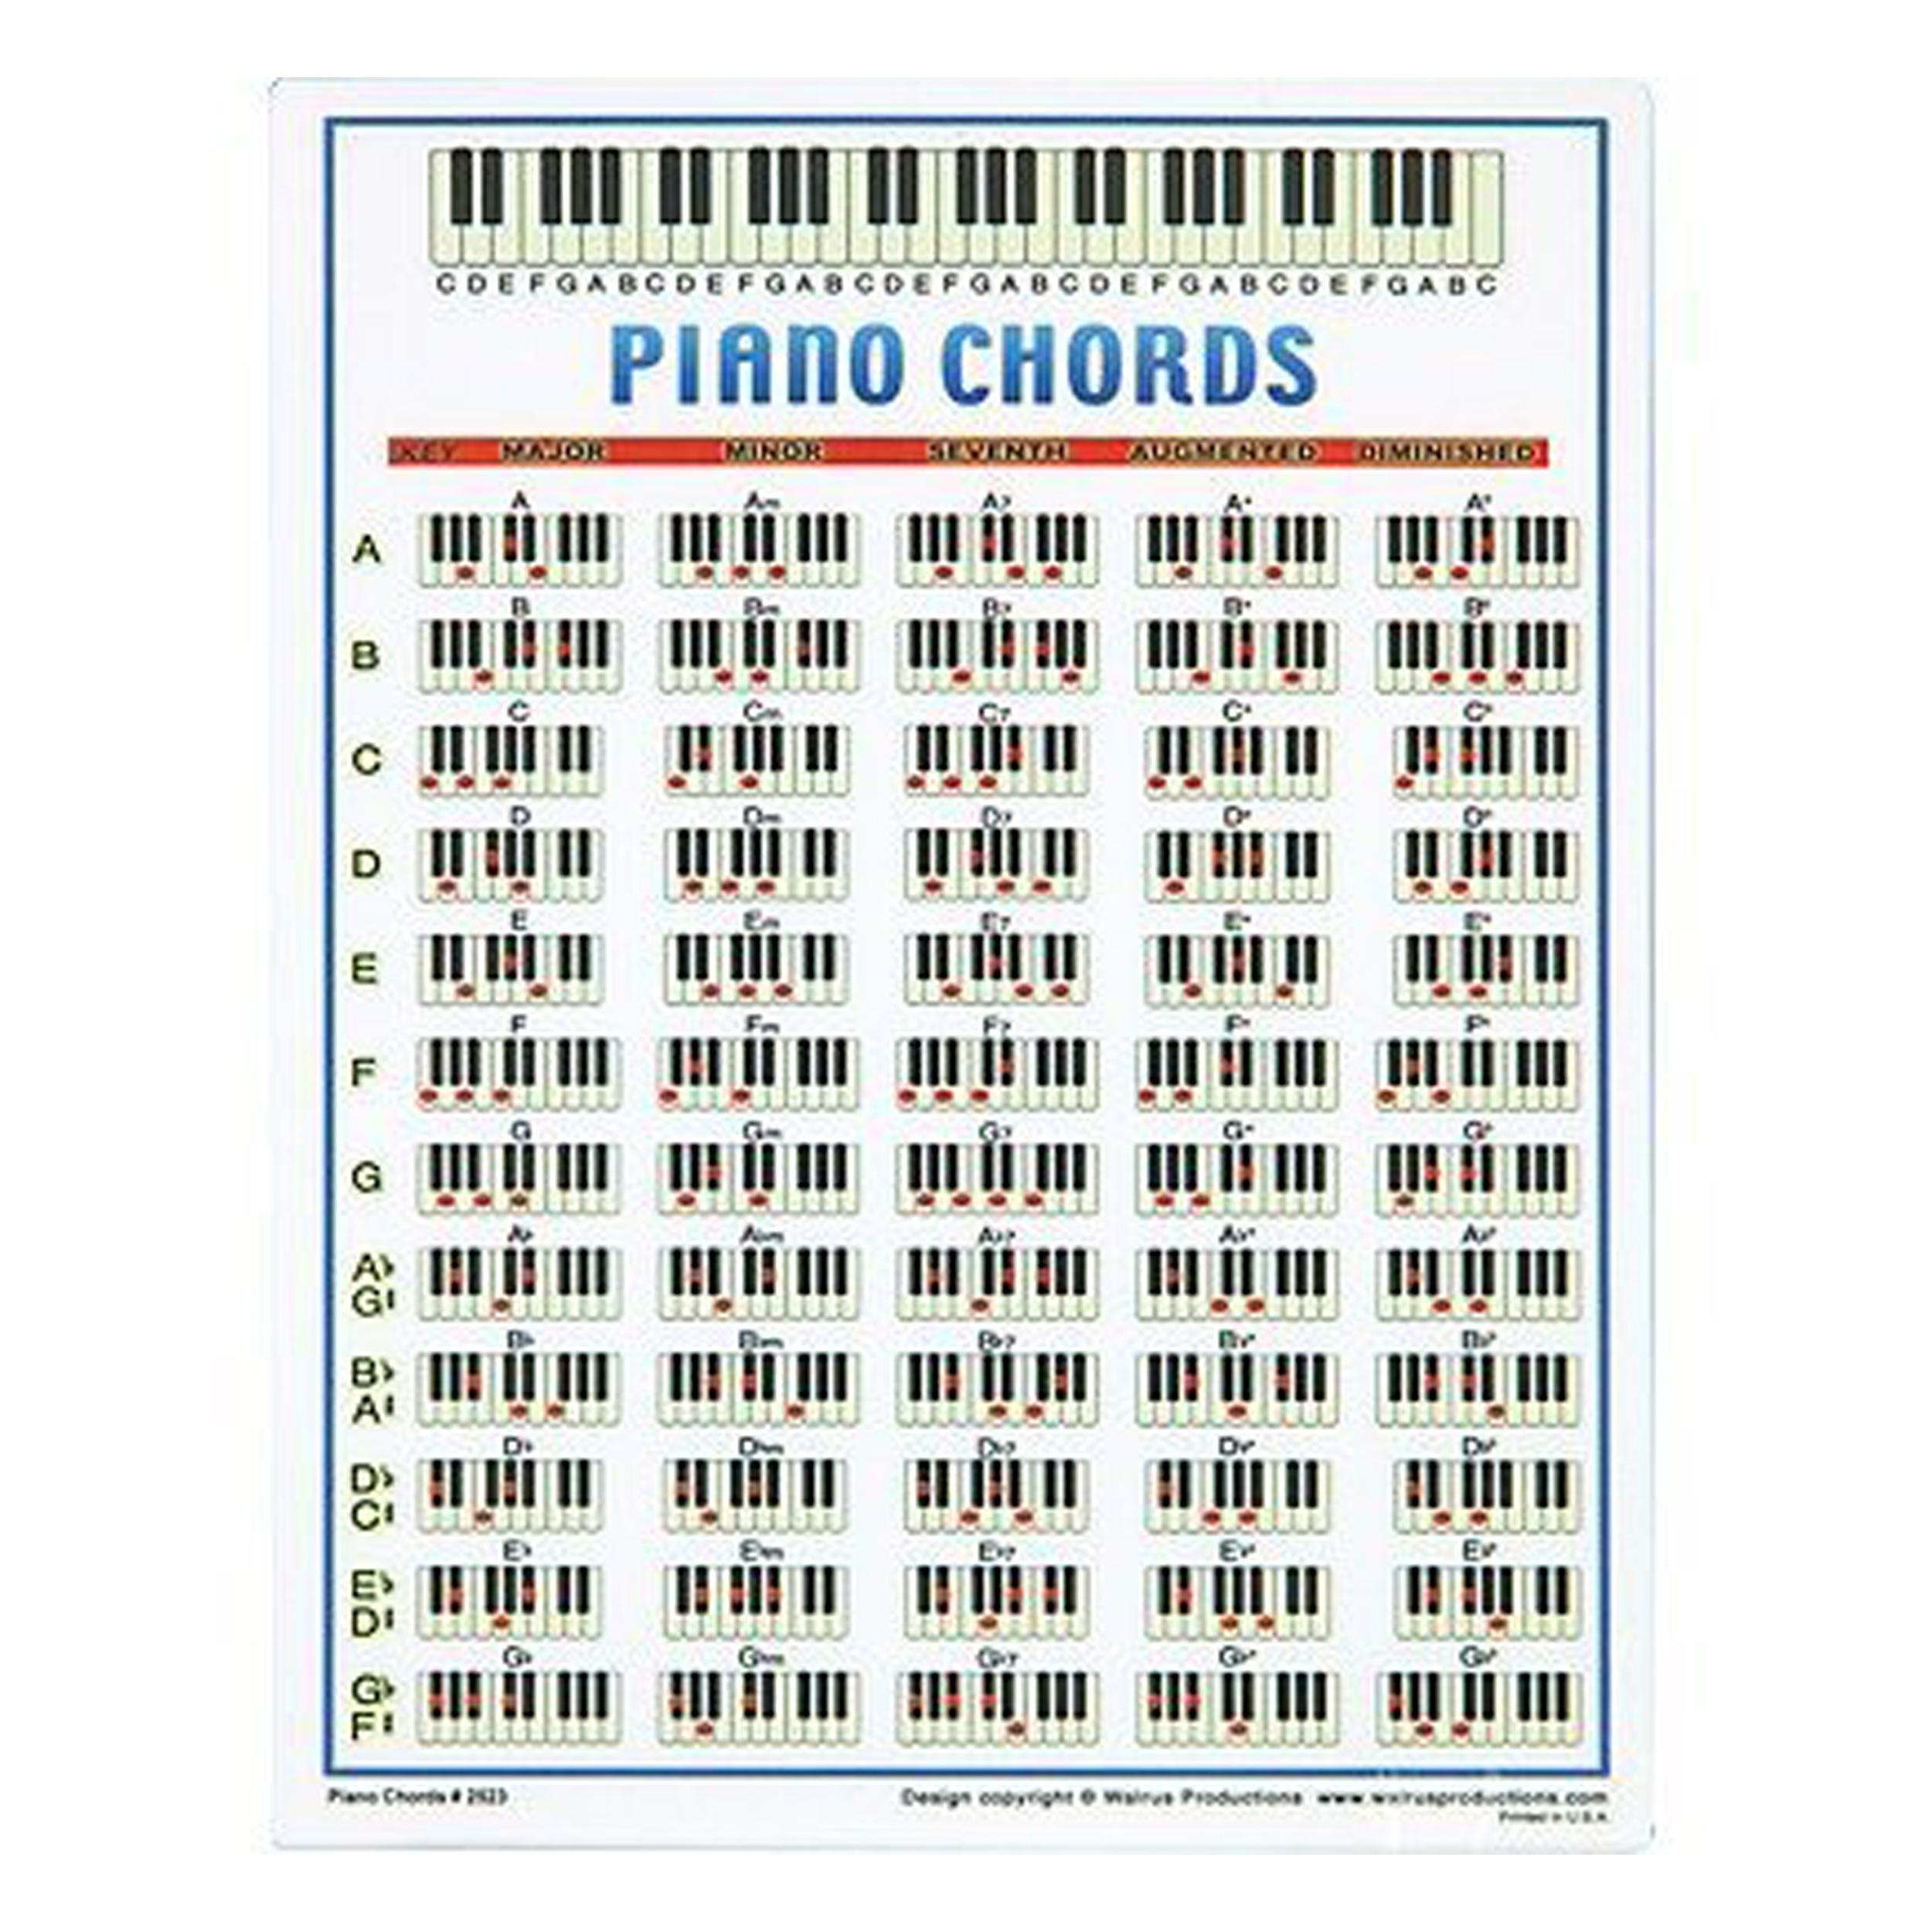 Piano Chord Chart Walrus Productions Piano Chord Mini Chart